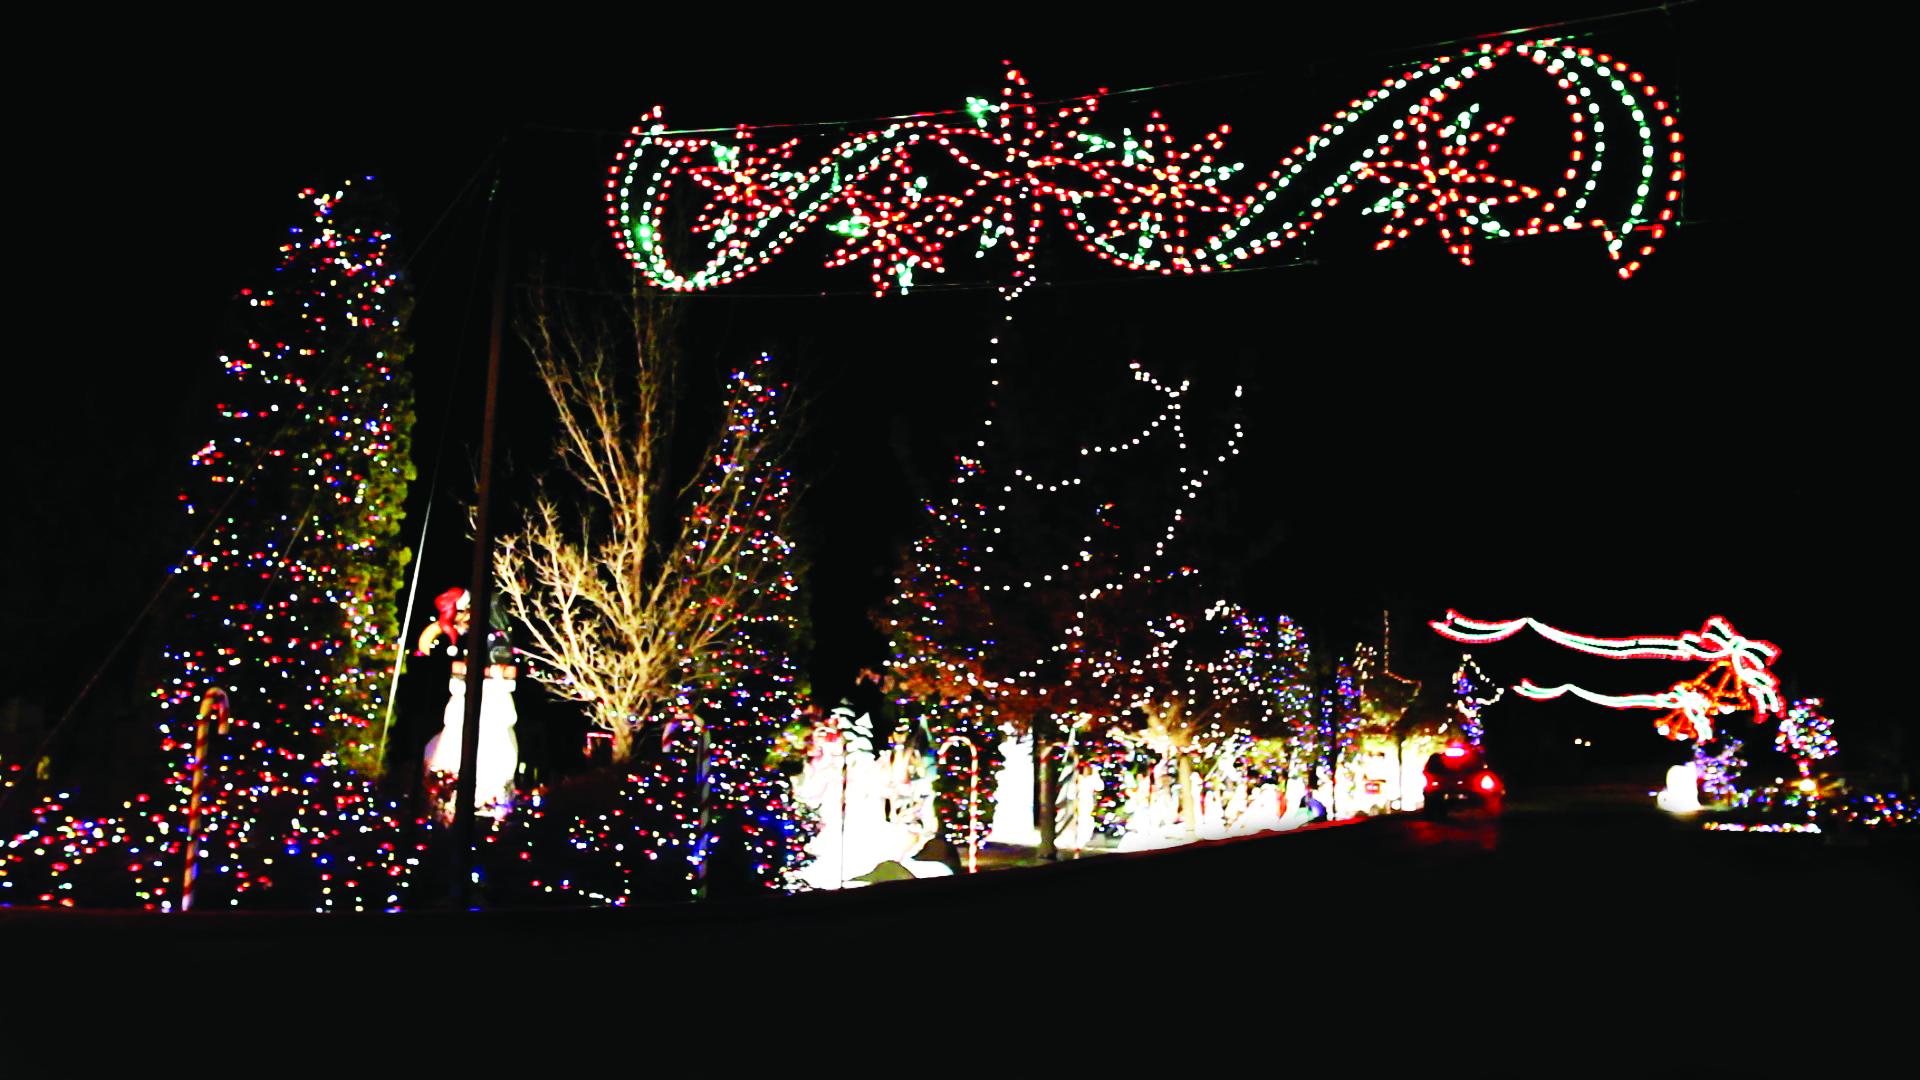 Candy Cane Outdoor Christmas Decorations Candycanelane